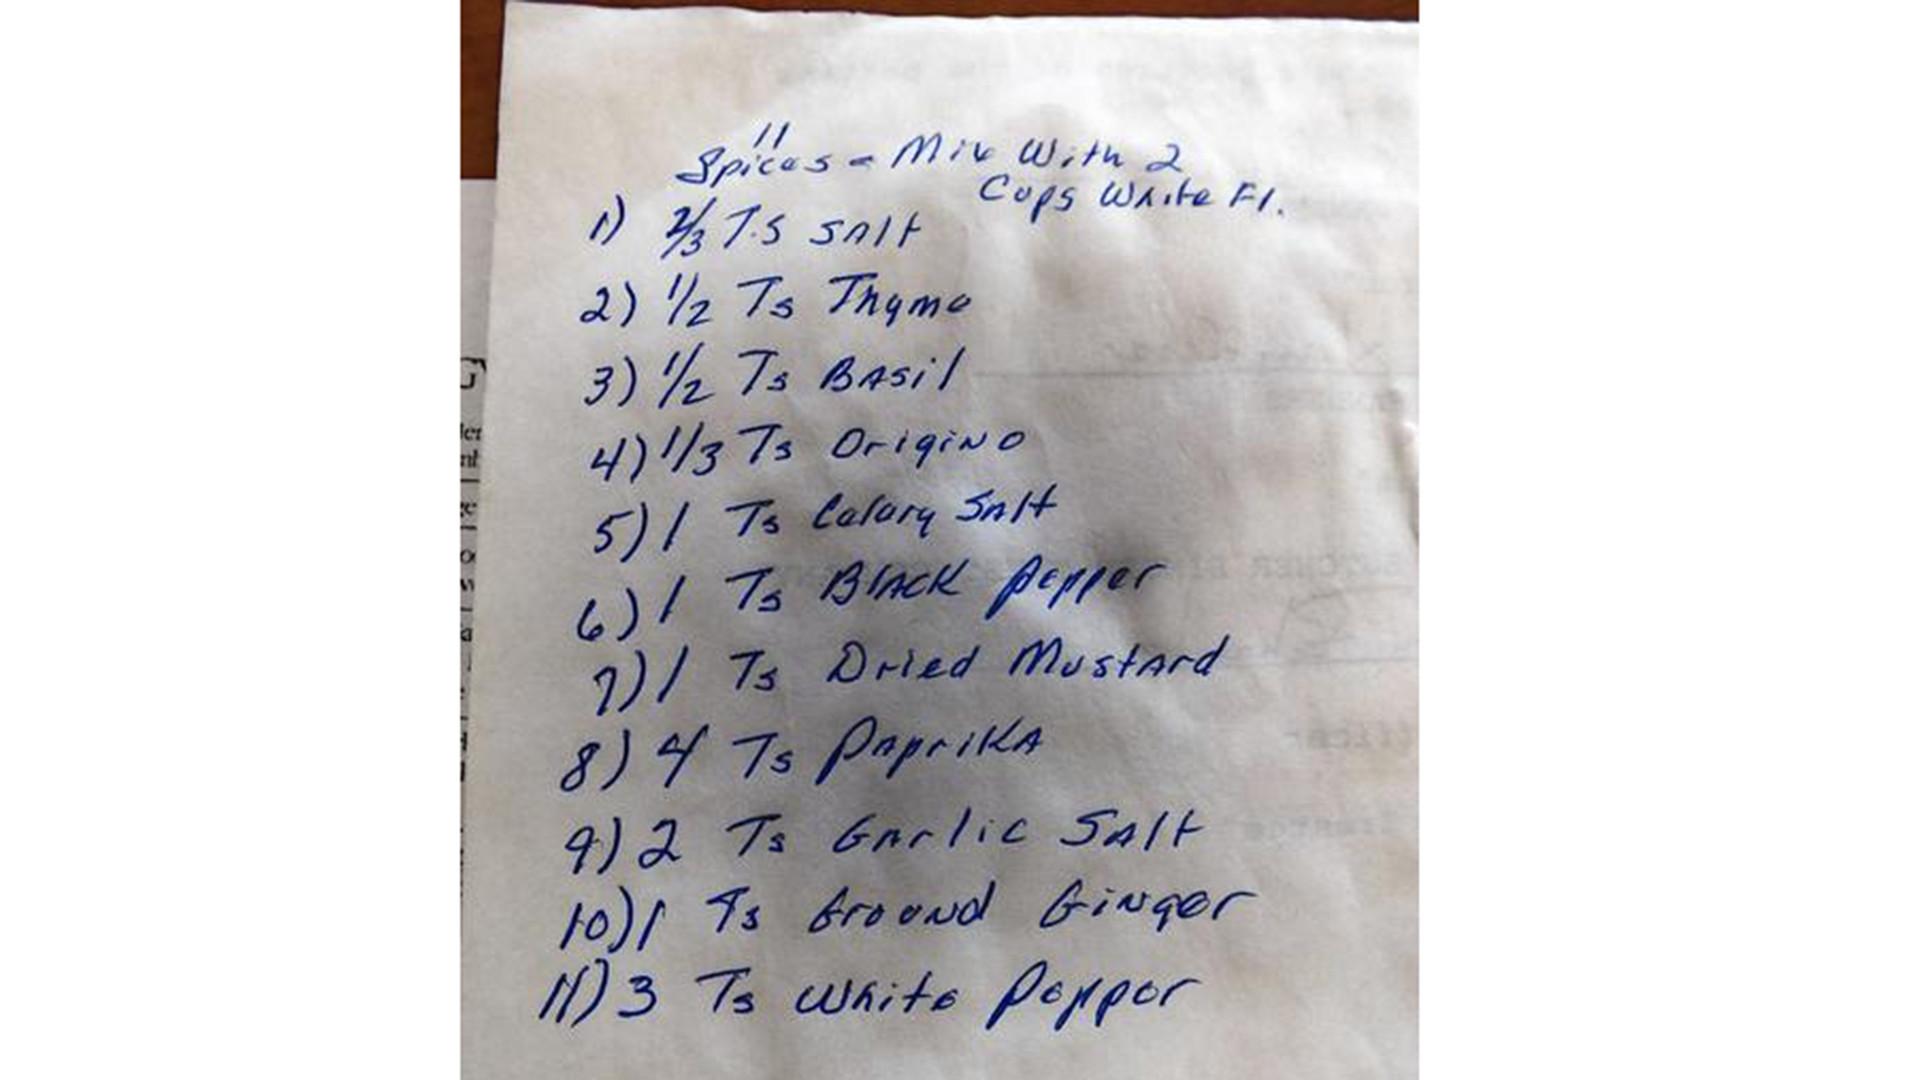 kfc recipe revealed tribune shown family scrapbook with 11 herbs